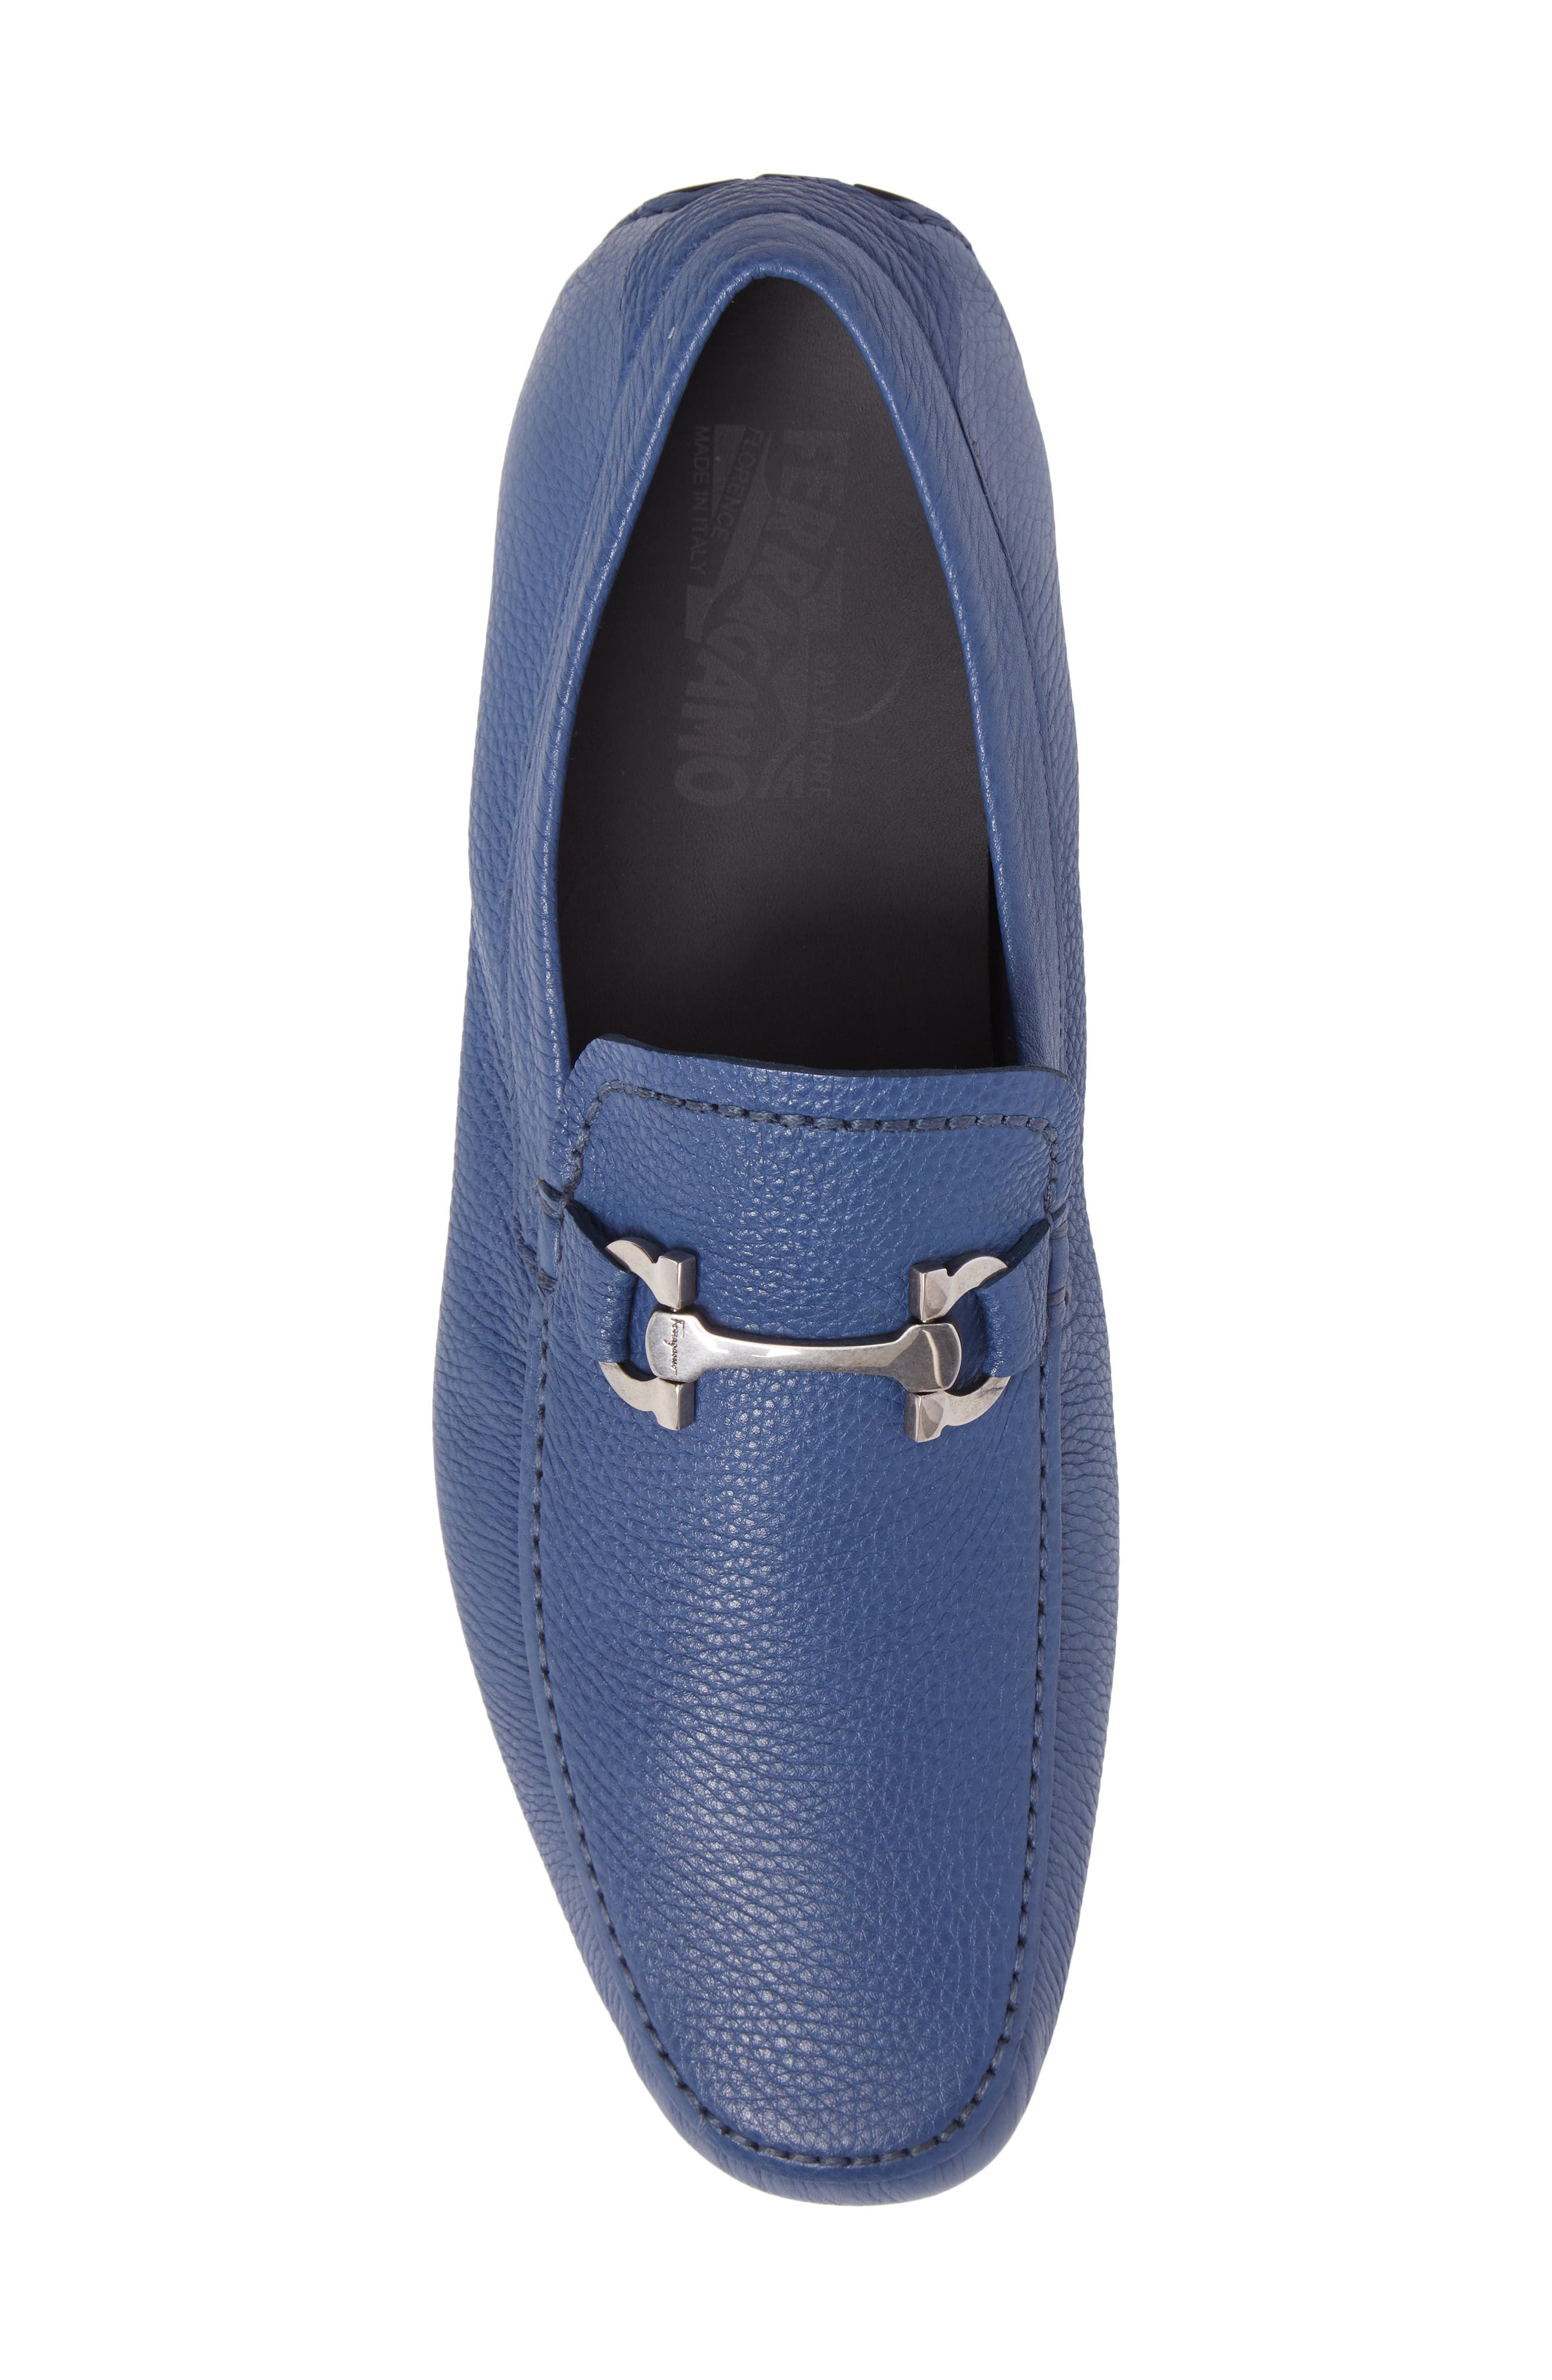 Cancun 2 Driving Shoe,                             Alternate thumbnail 5, color,                             Fjord Blue